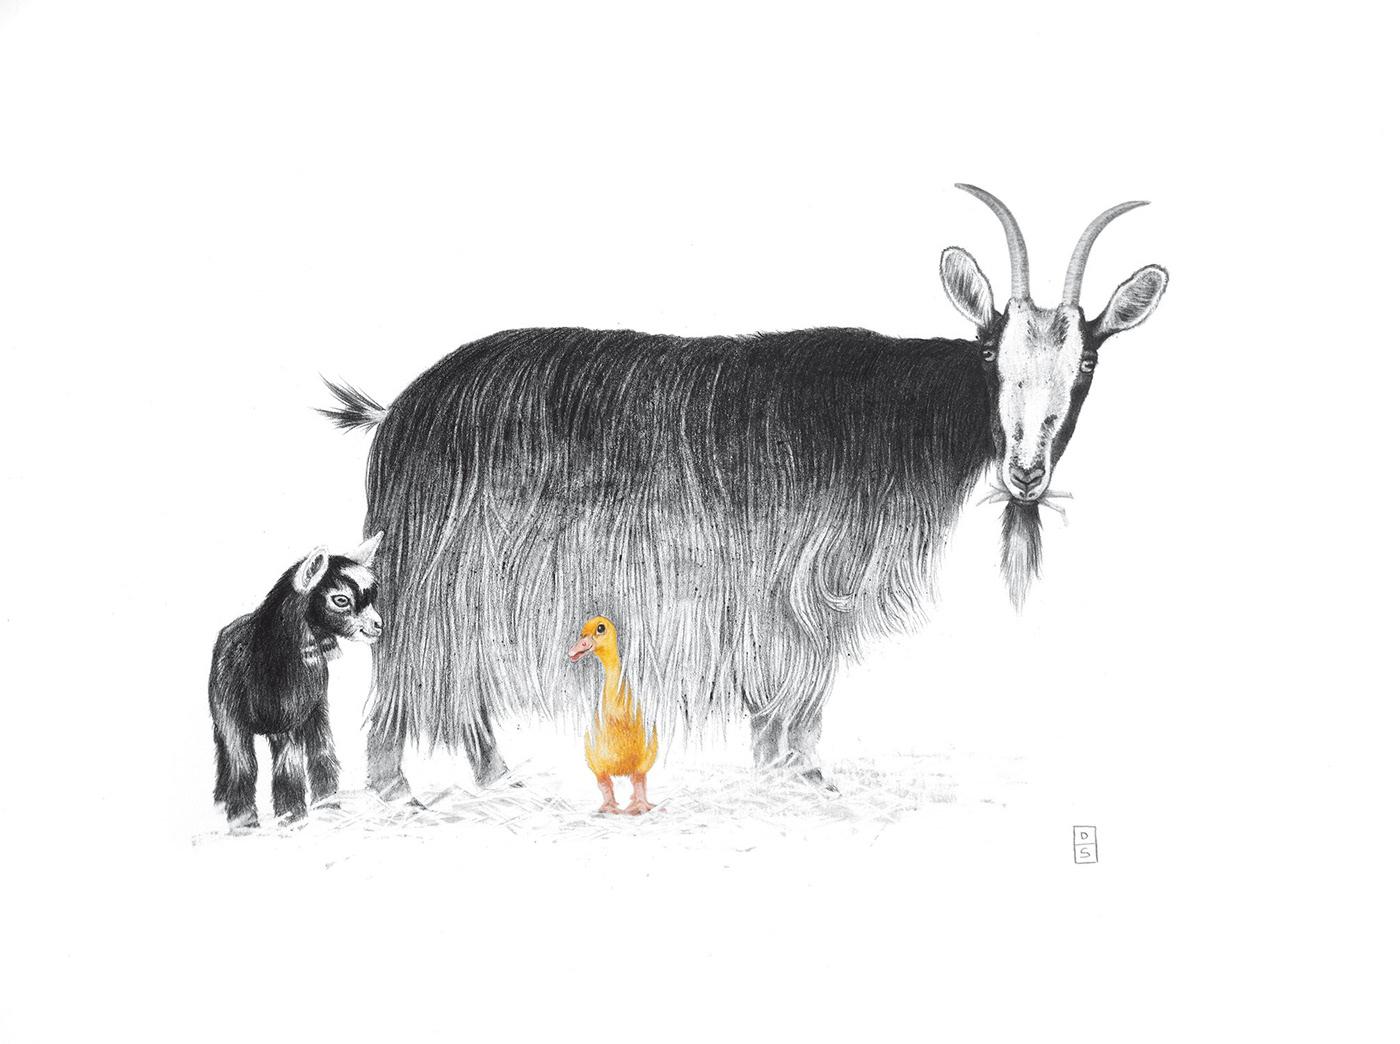 animal,farm,pig,Goose,sheep,chicken,Drawing